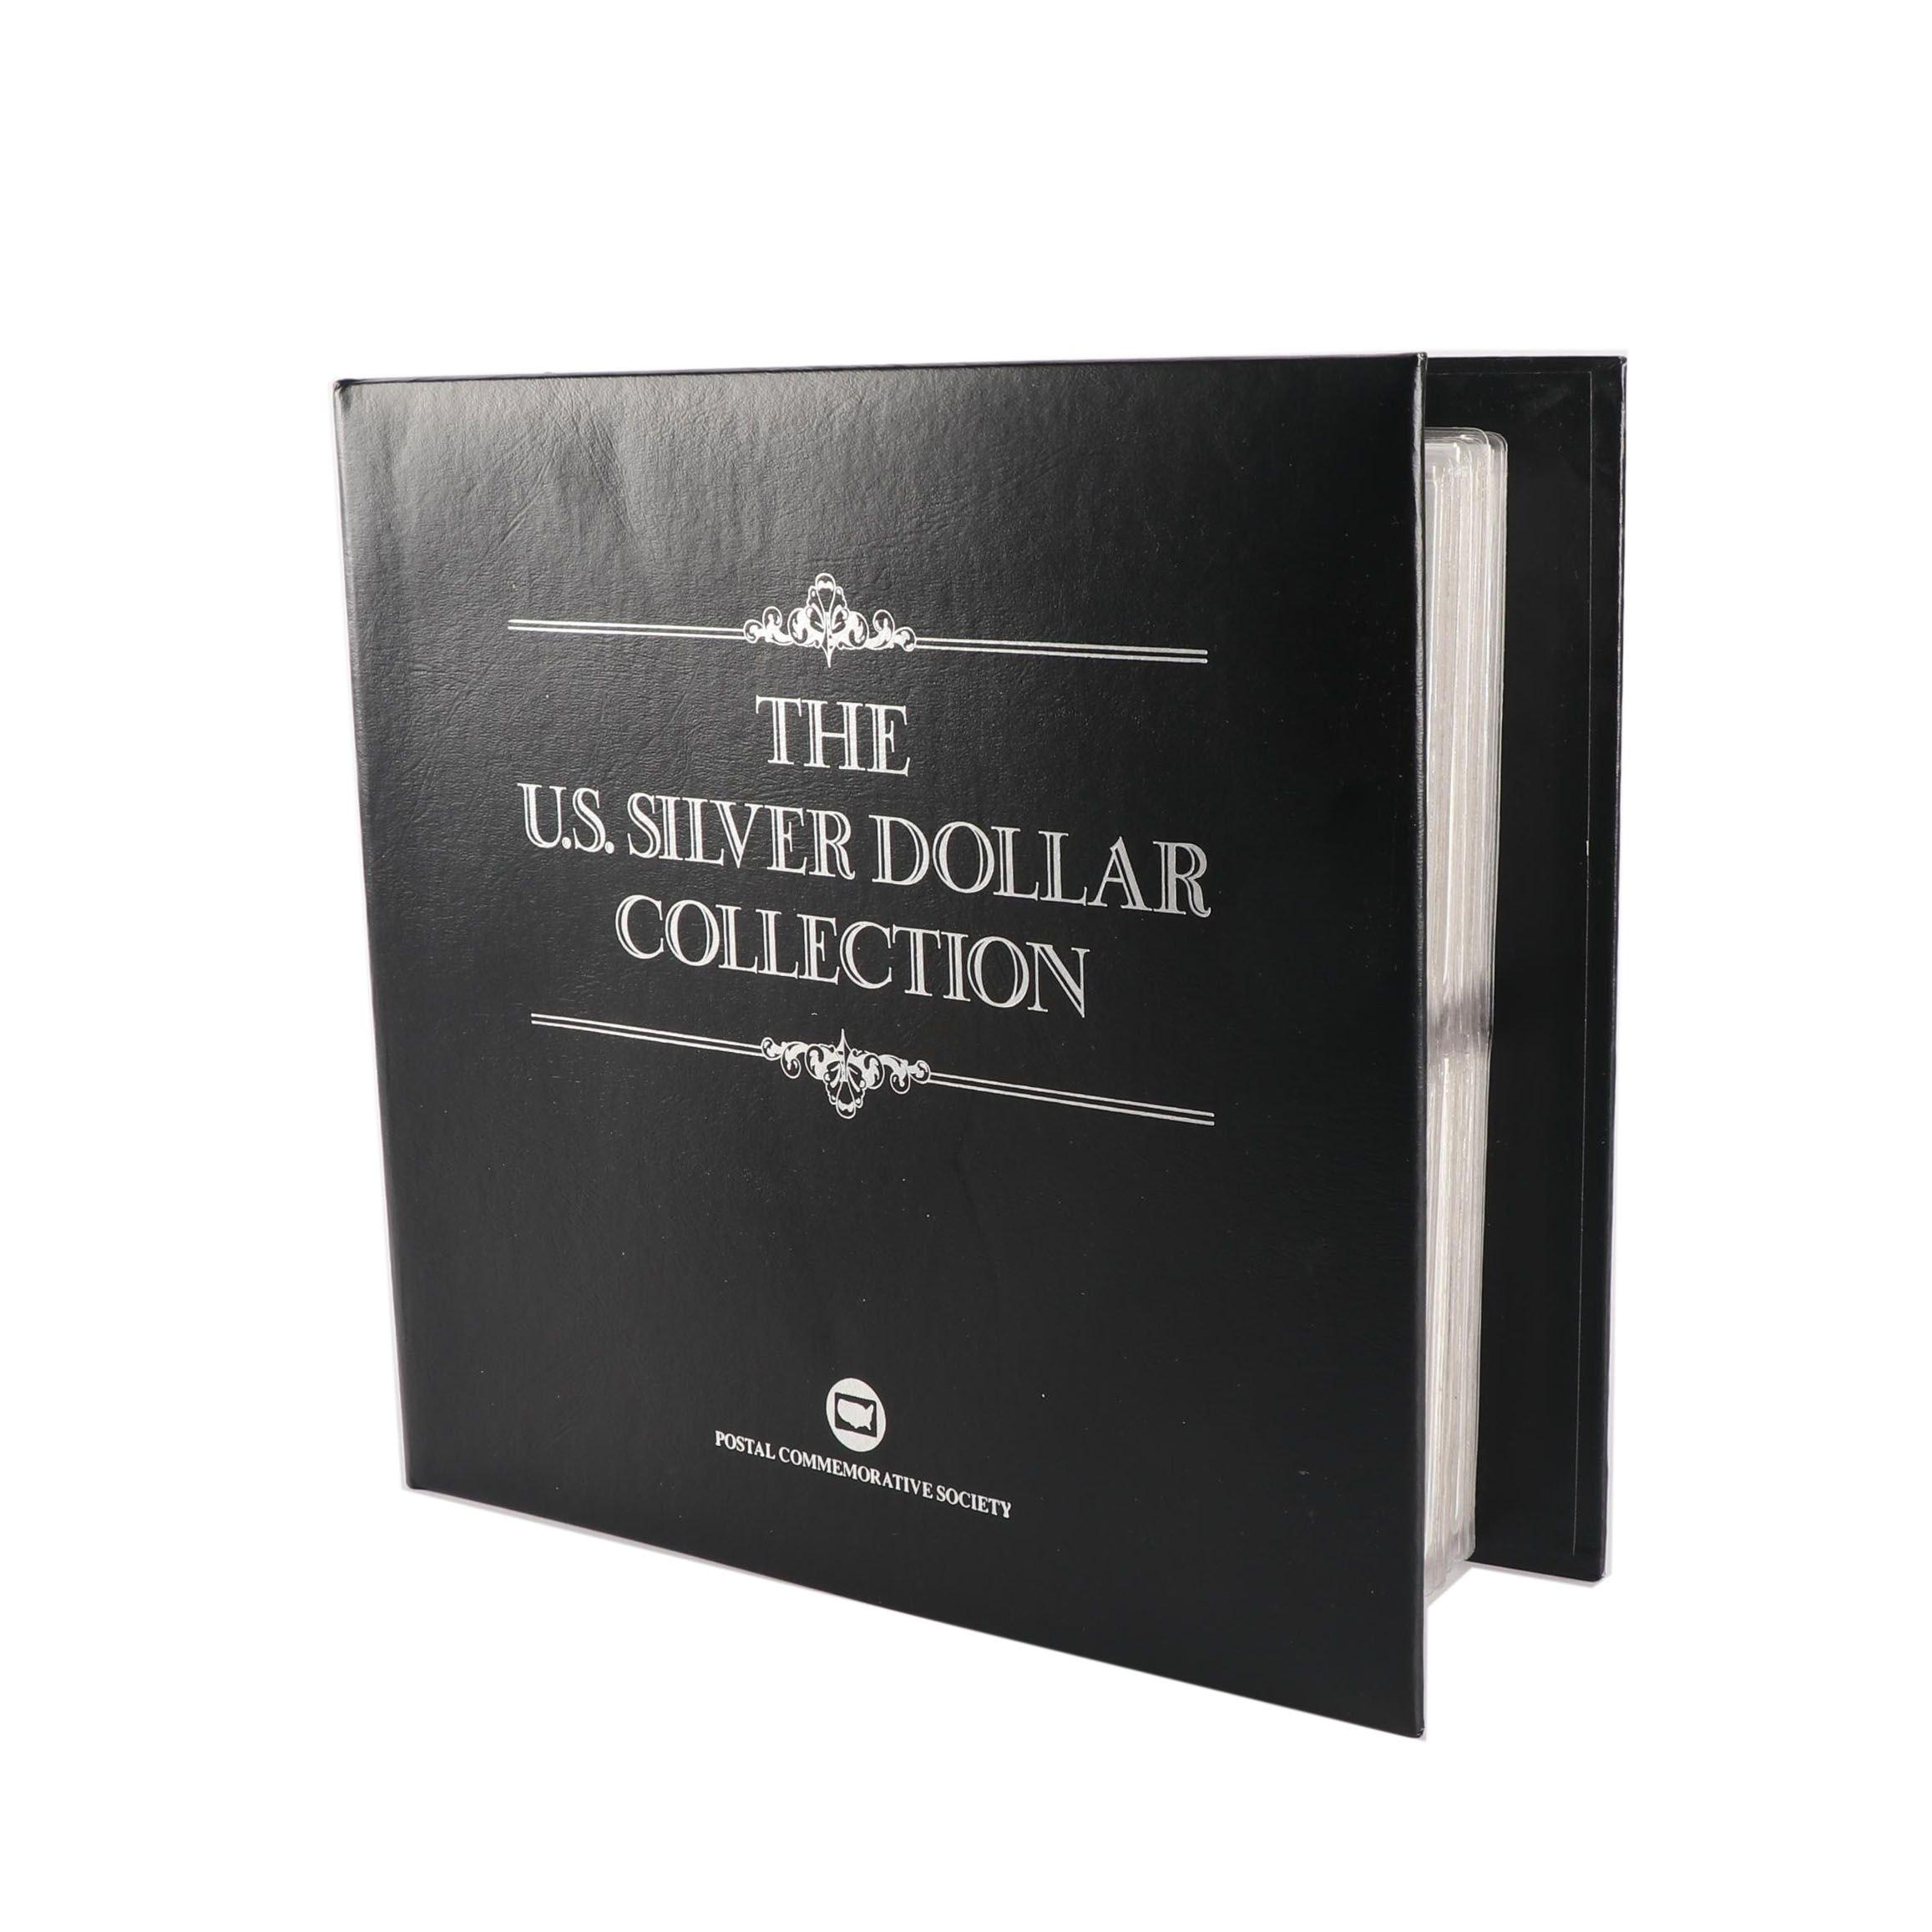 PCS The U.S. Silver Dollar Collection Album